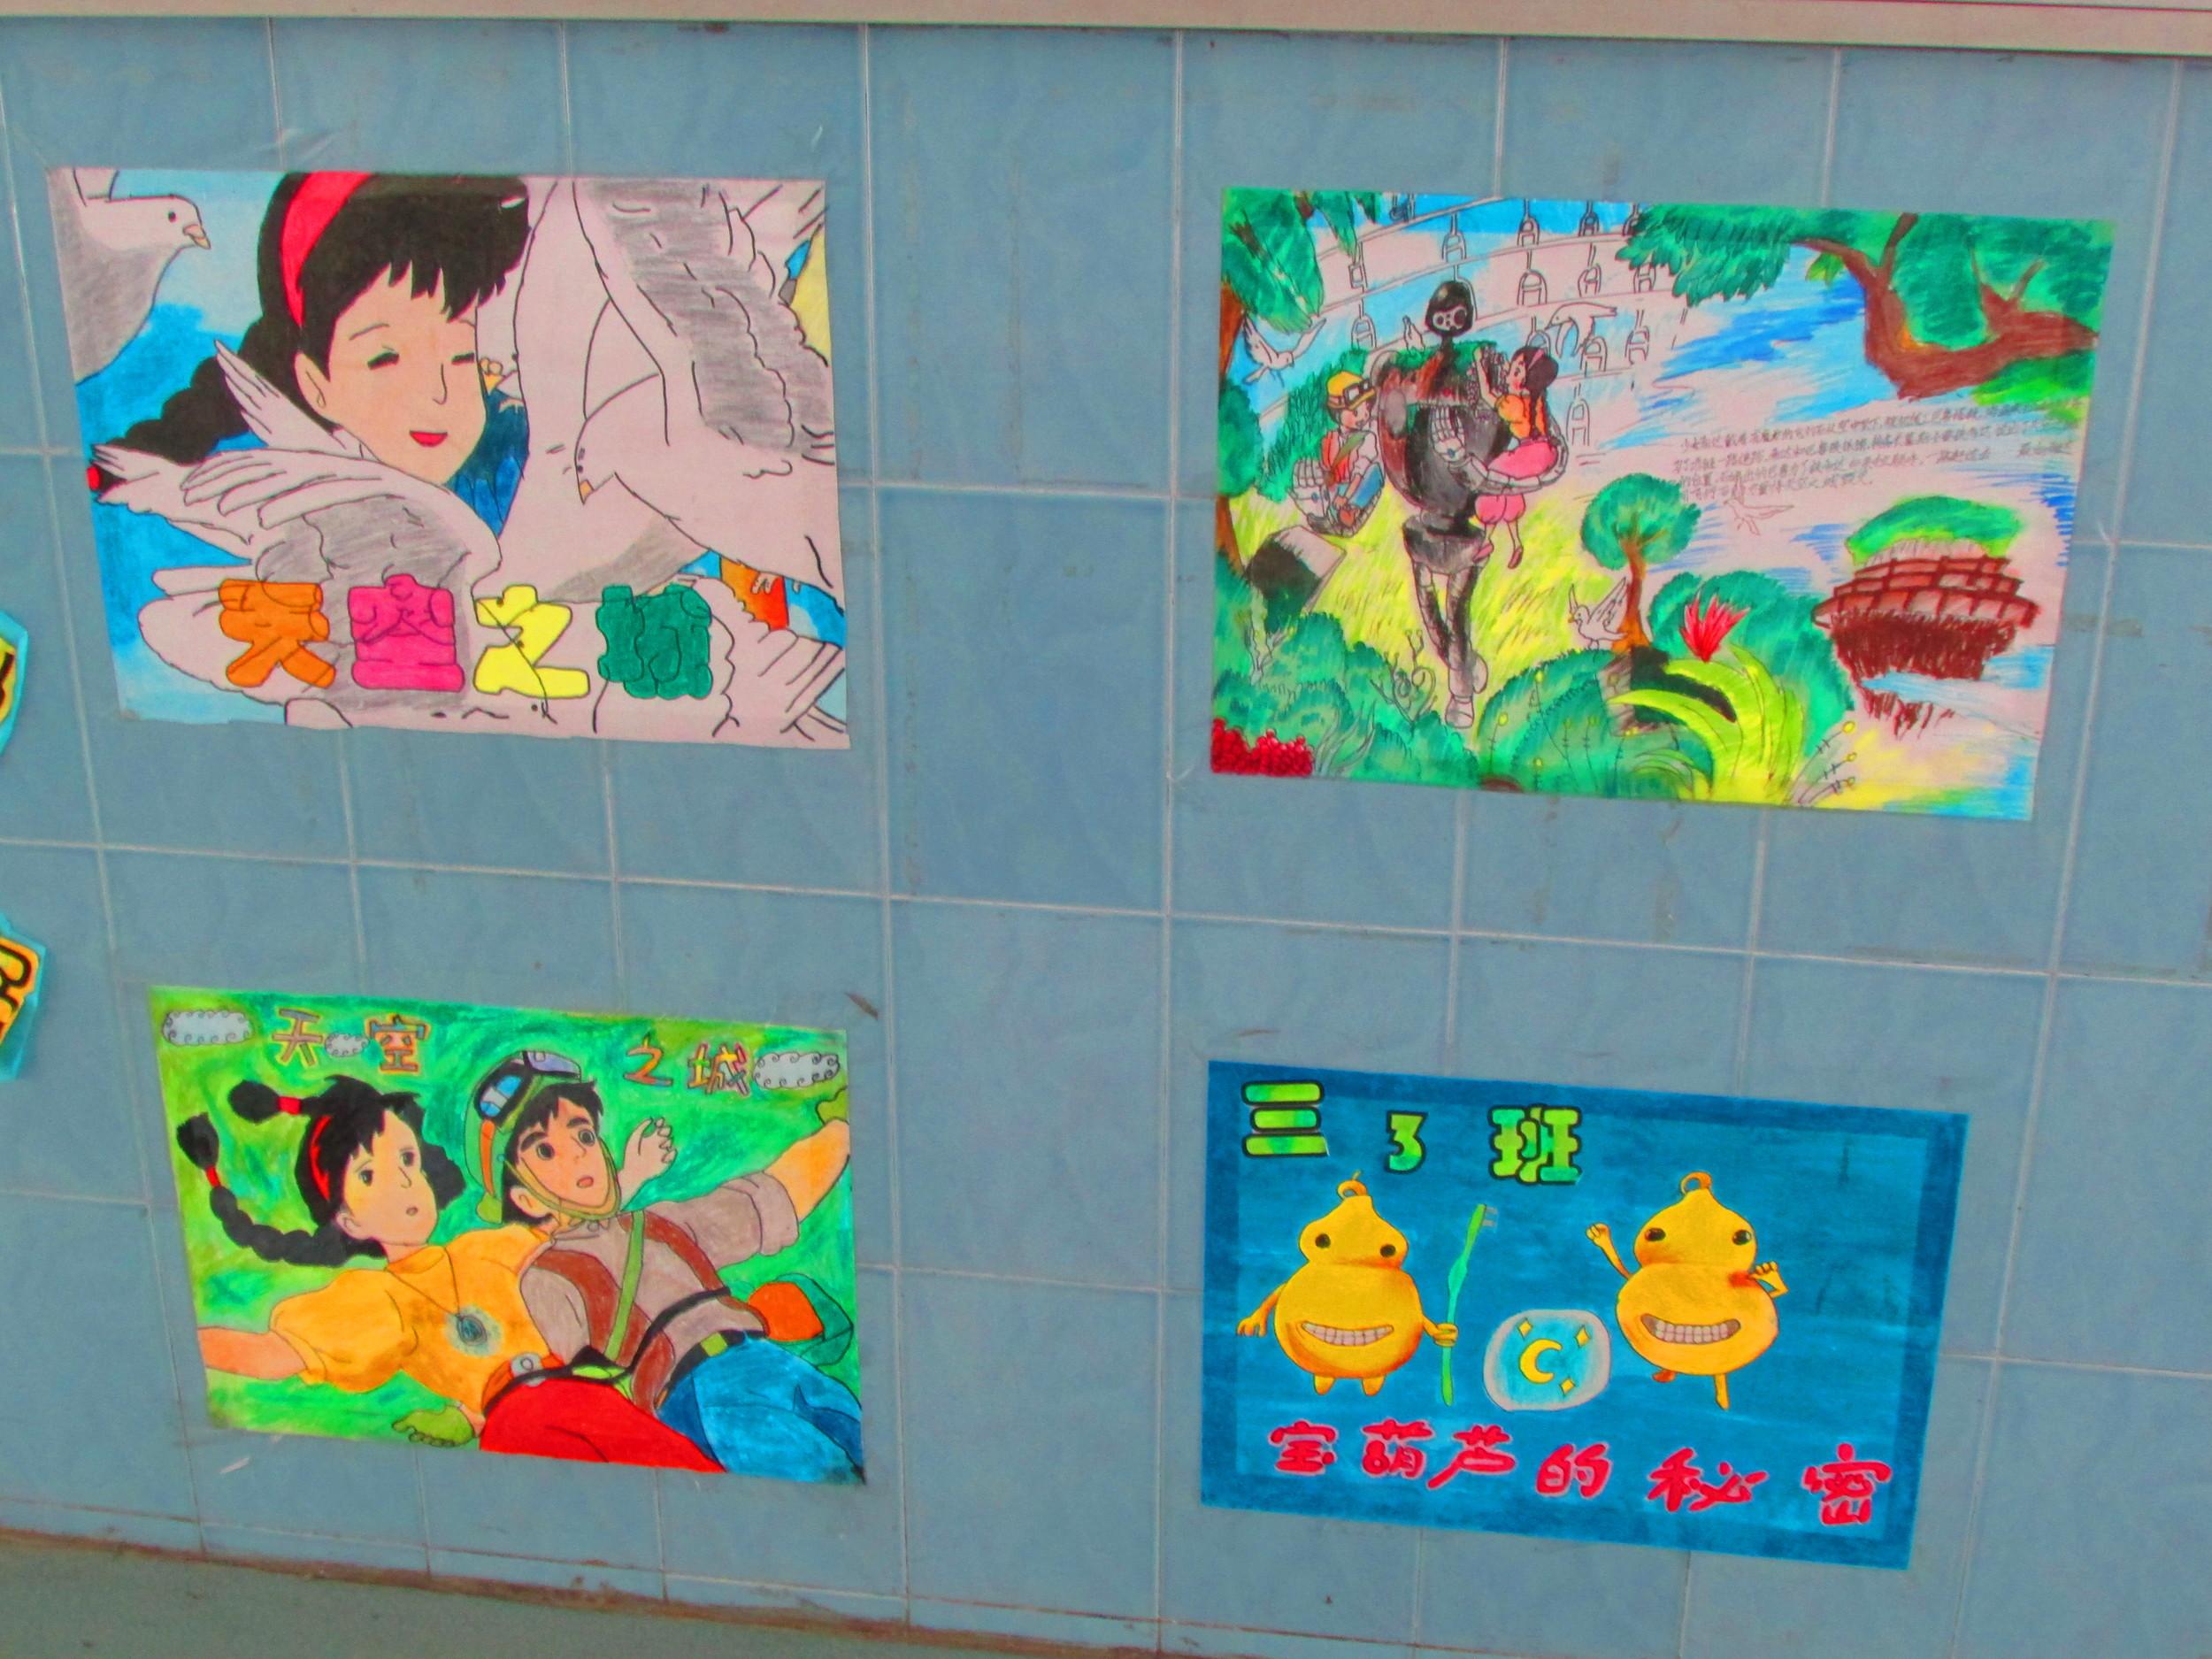 Beautiful art my students did based off what look like Studio Ghibli movies.